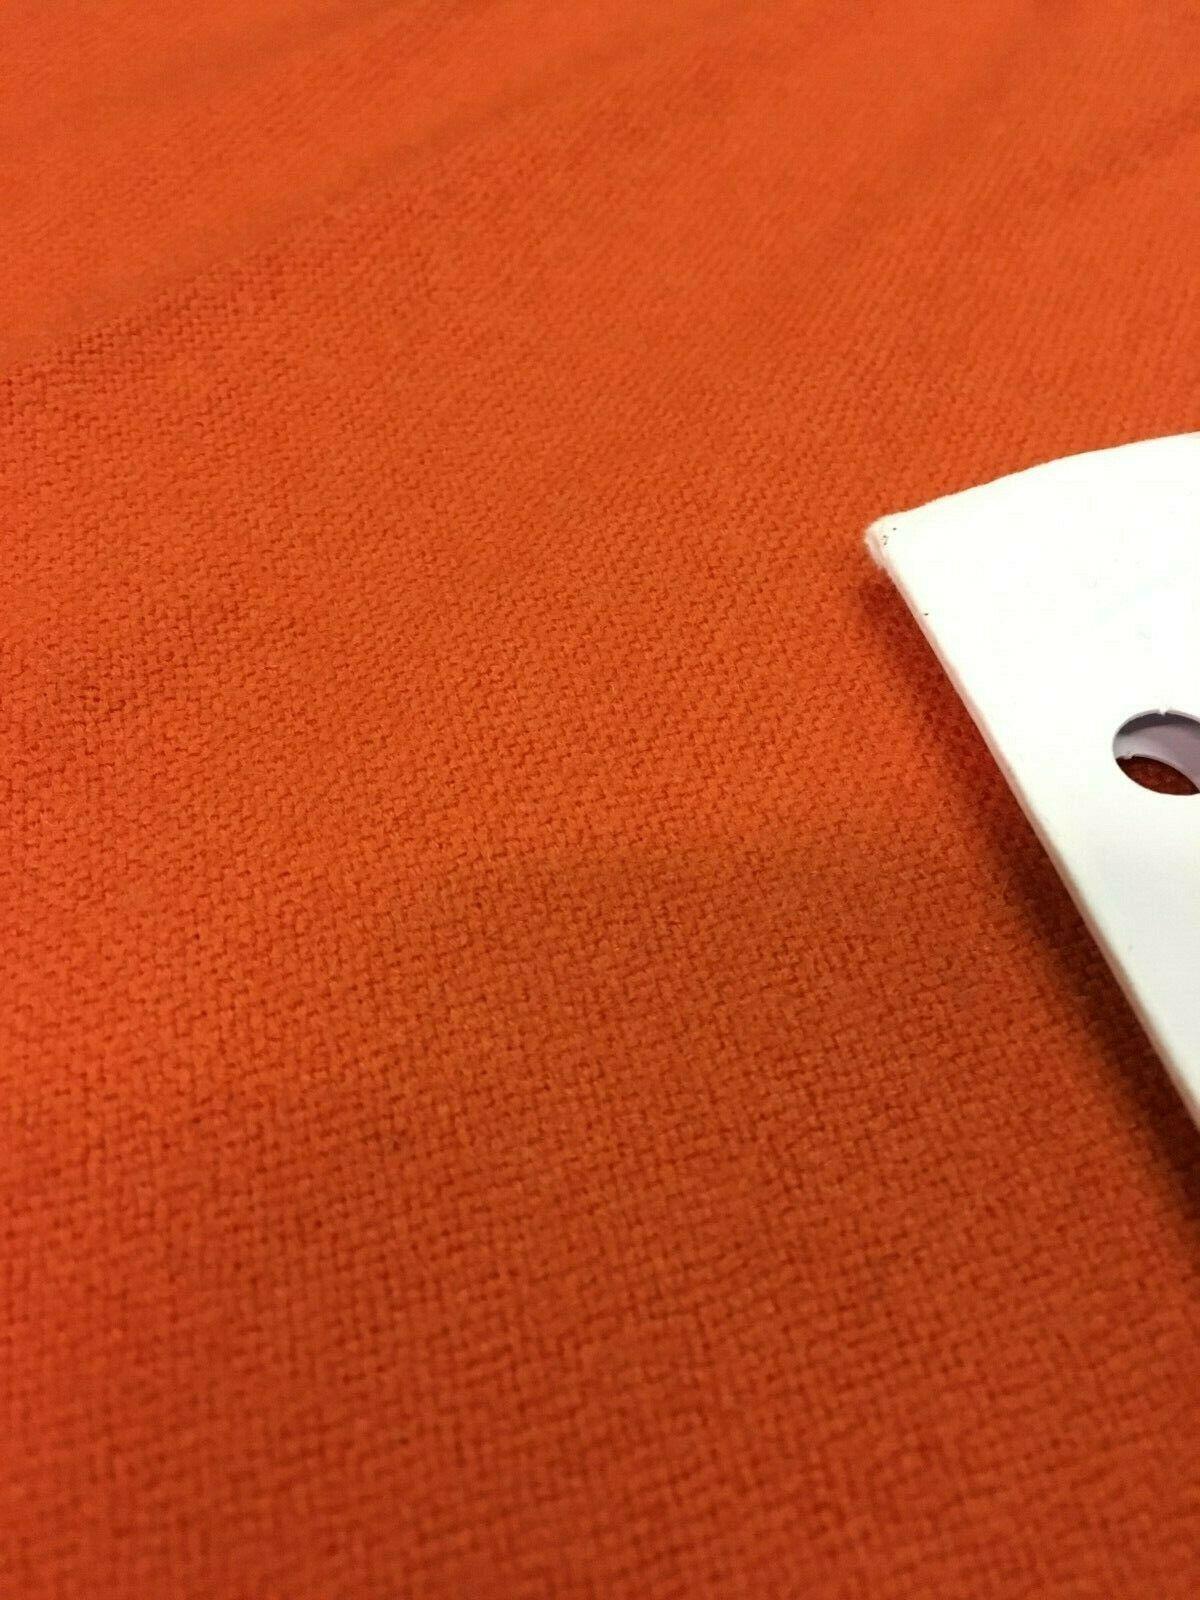 Mid Century Upholstery Fabric Hopsack Orange Wool 1.25 yds PH